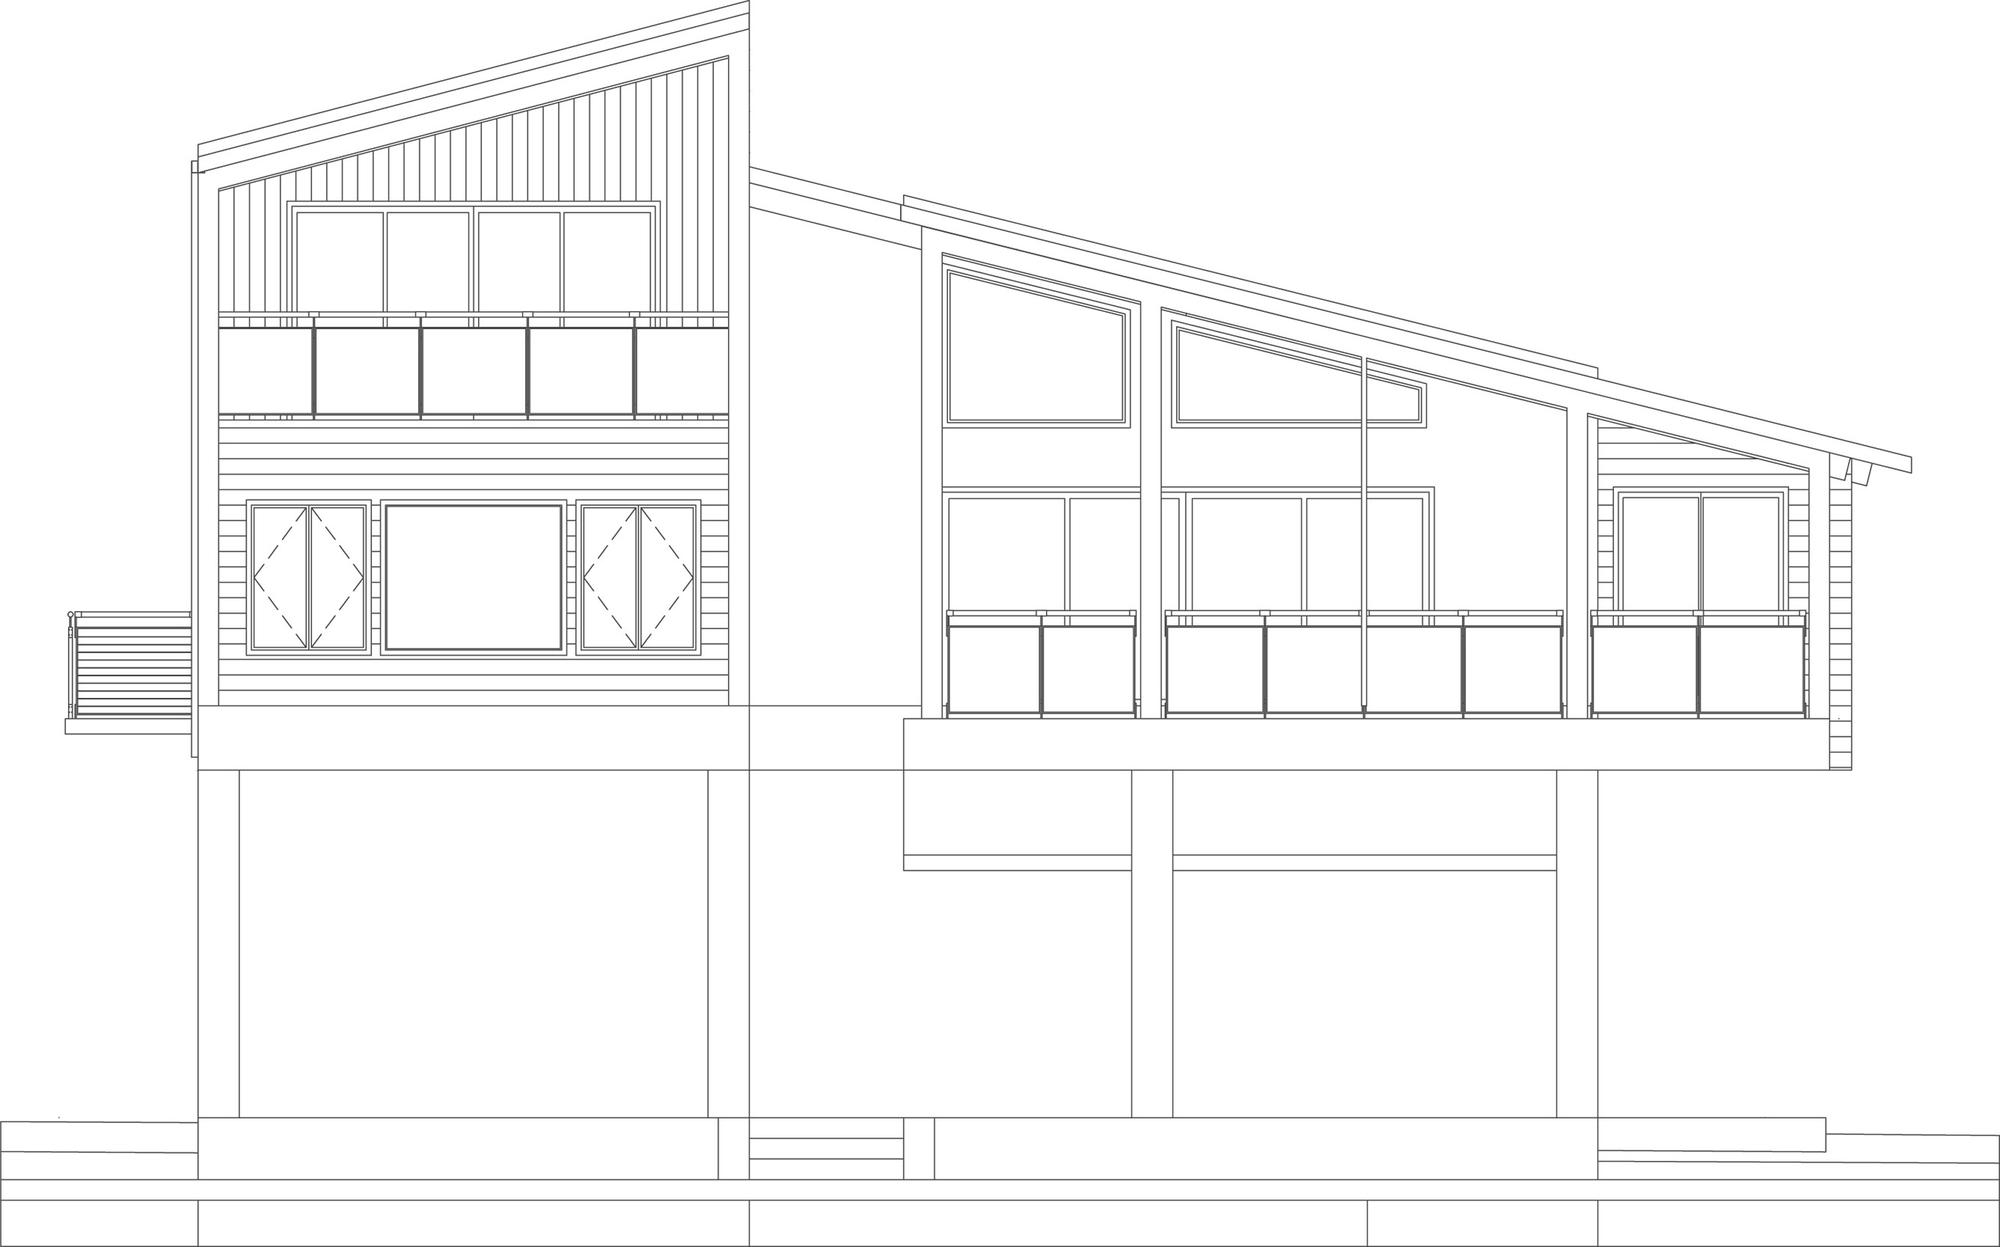 residencia-tavernier-drive-luis-pons-design-lab_101-house_renovation_-_tavernier_key_fl-_facade